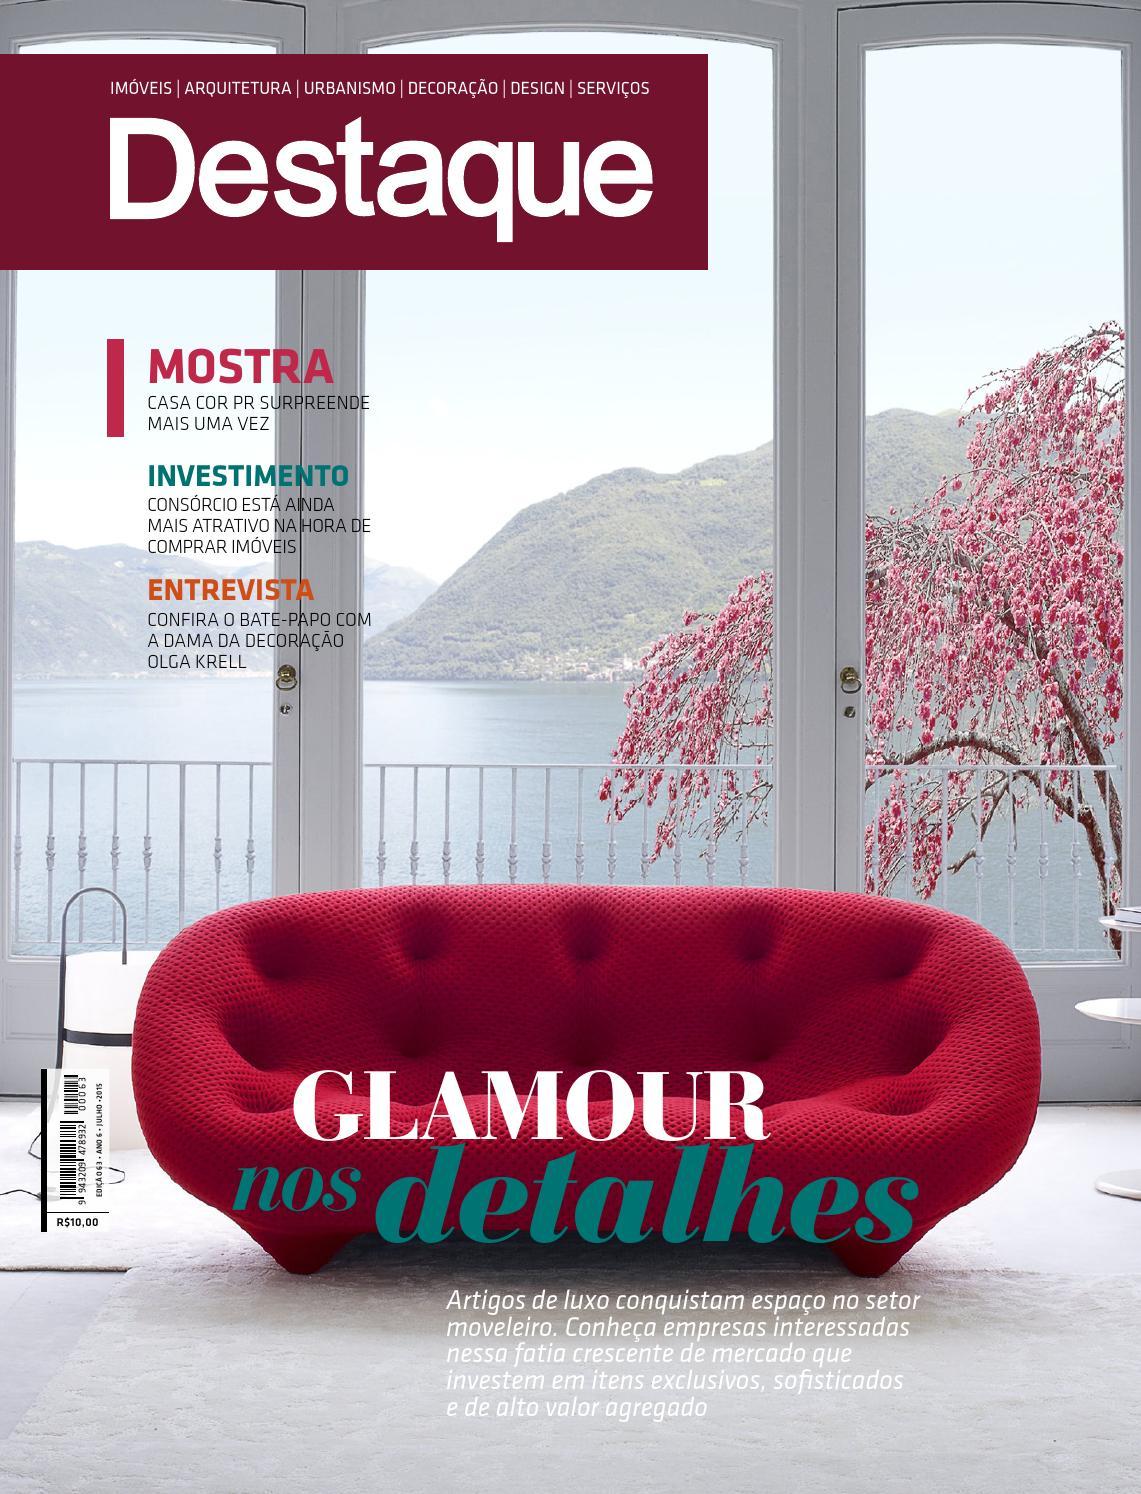 7251e856f3f Revista Destaque Imobiliario Julho 2015 by Revista Destaque Decor - issuu